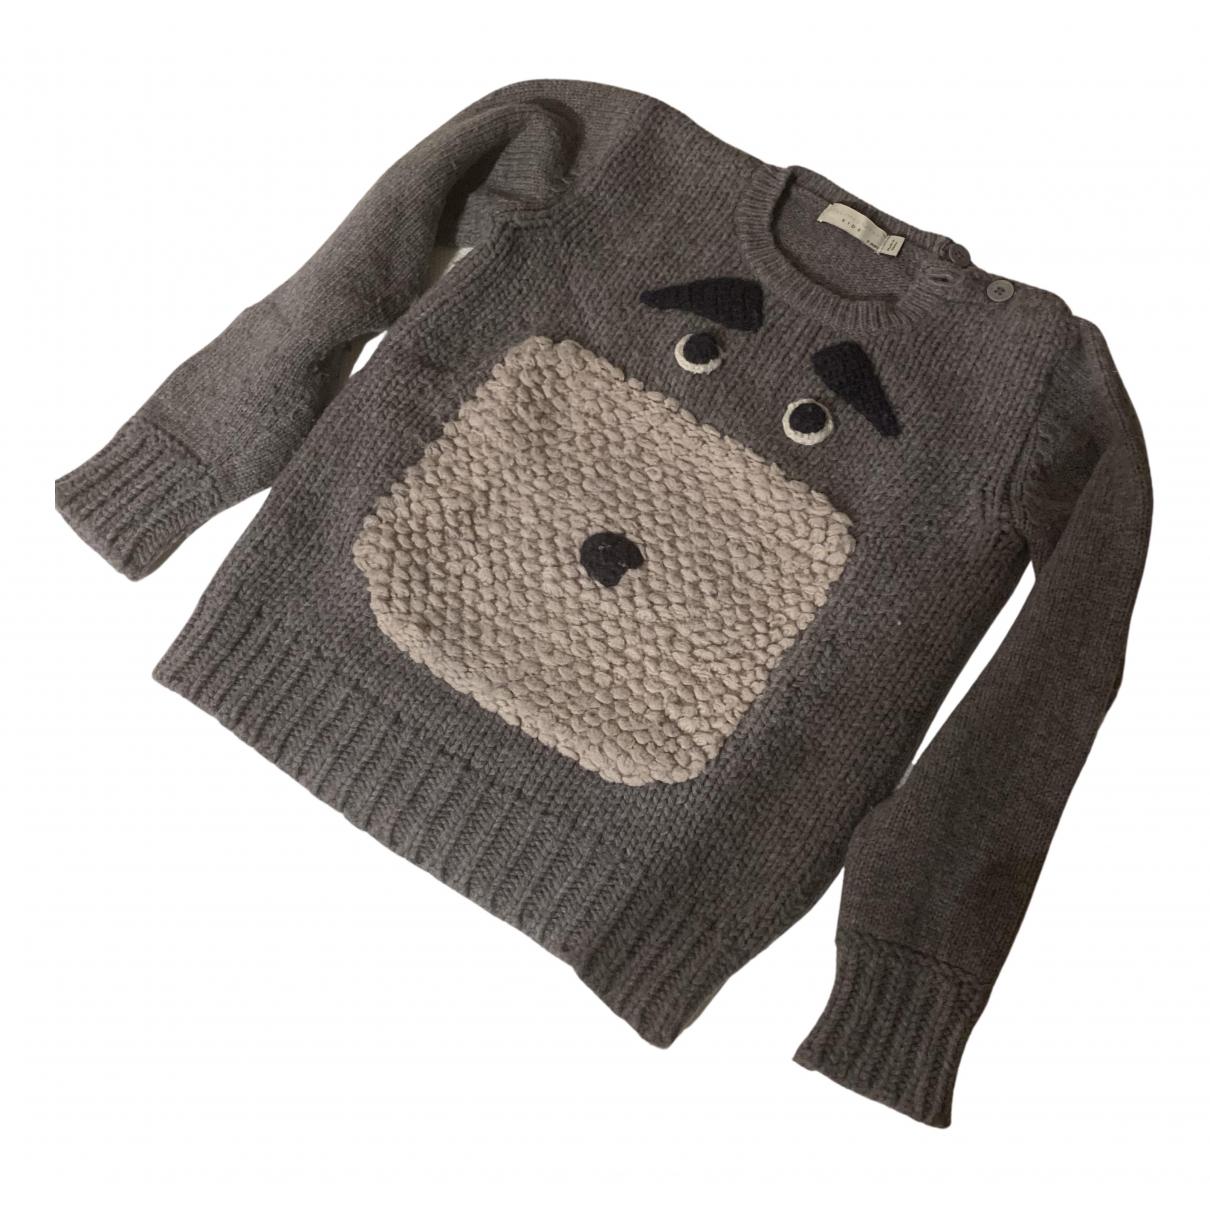 Stella Mccartney N Grey Wool Knitwear for Kids 8 years - until 50 inches UK